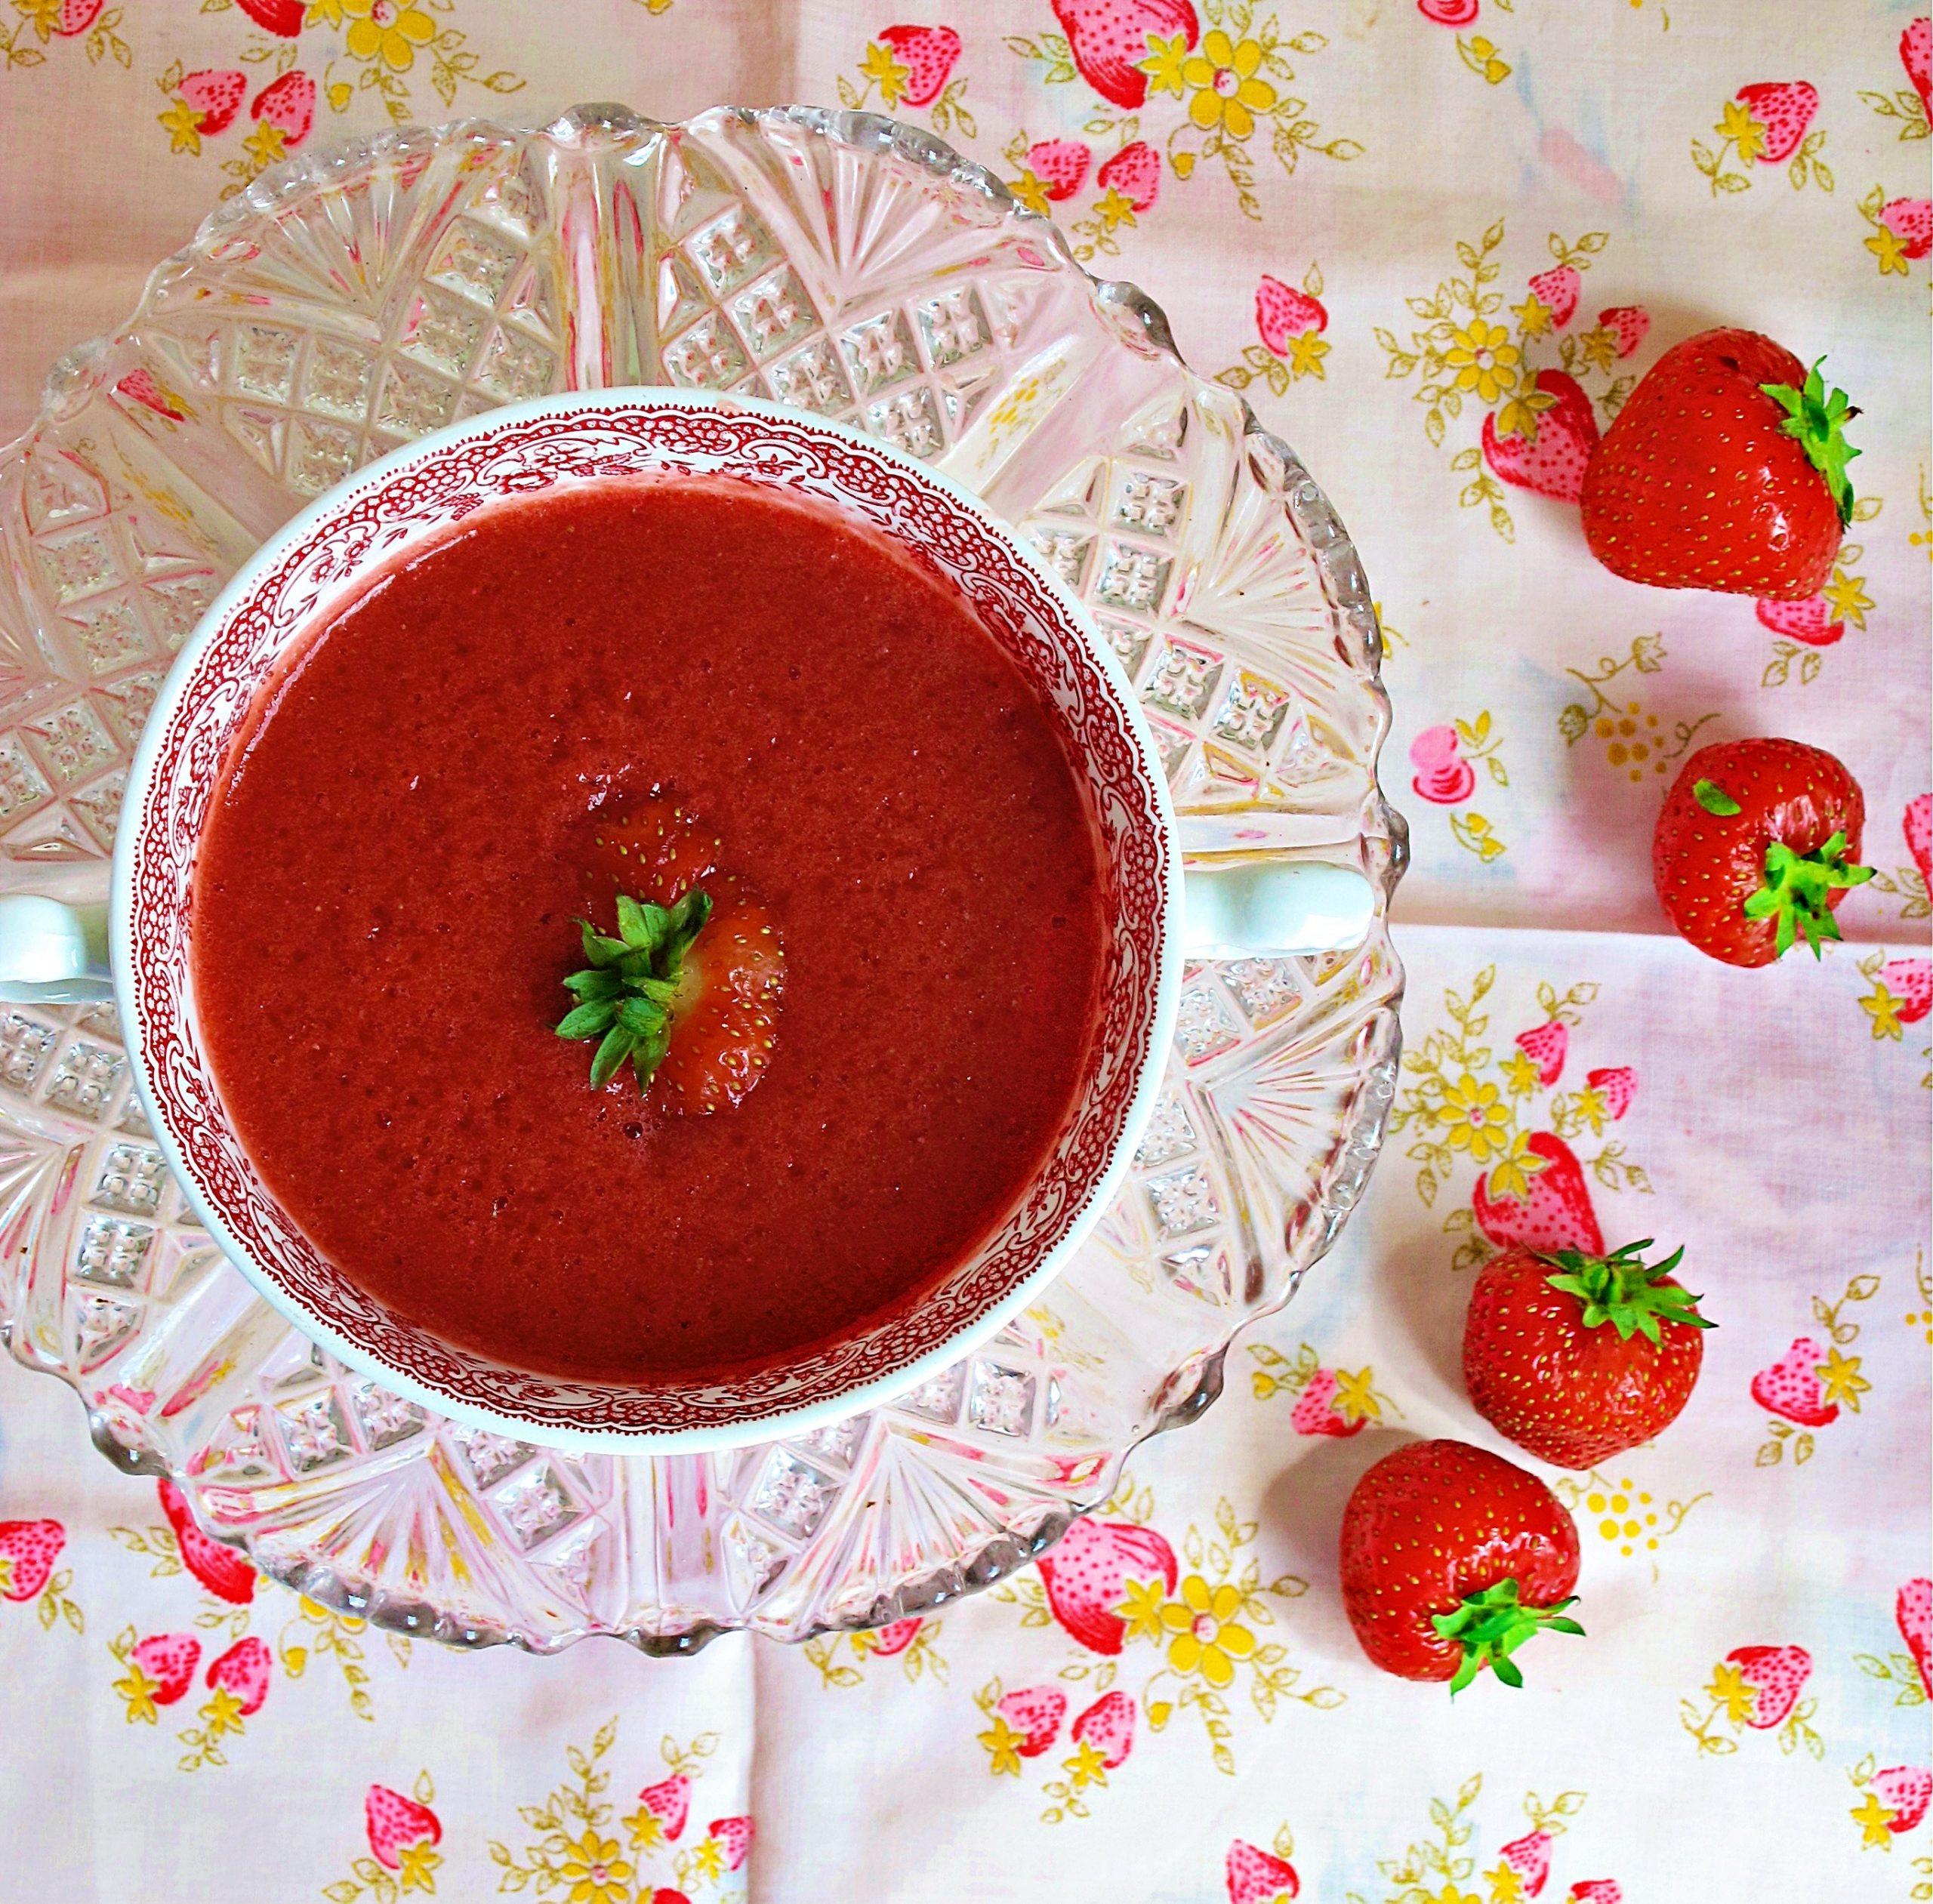 strawberry hibiscus soup pic: Kerstin rodgers/msmarmitelover.com